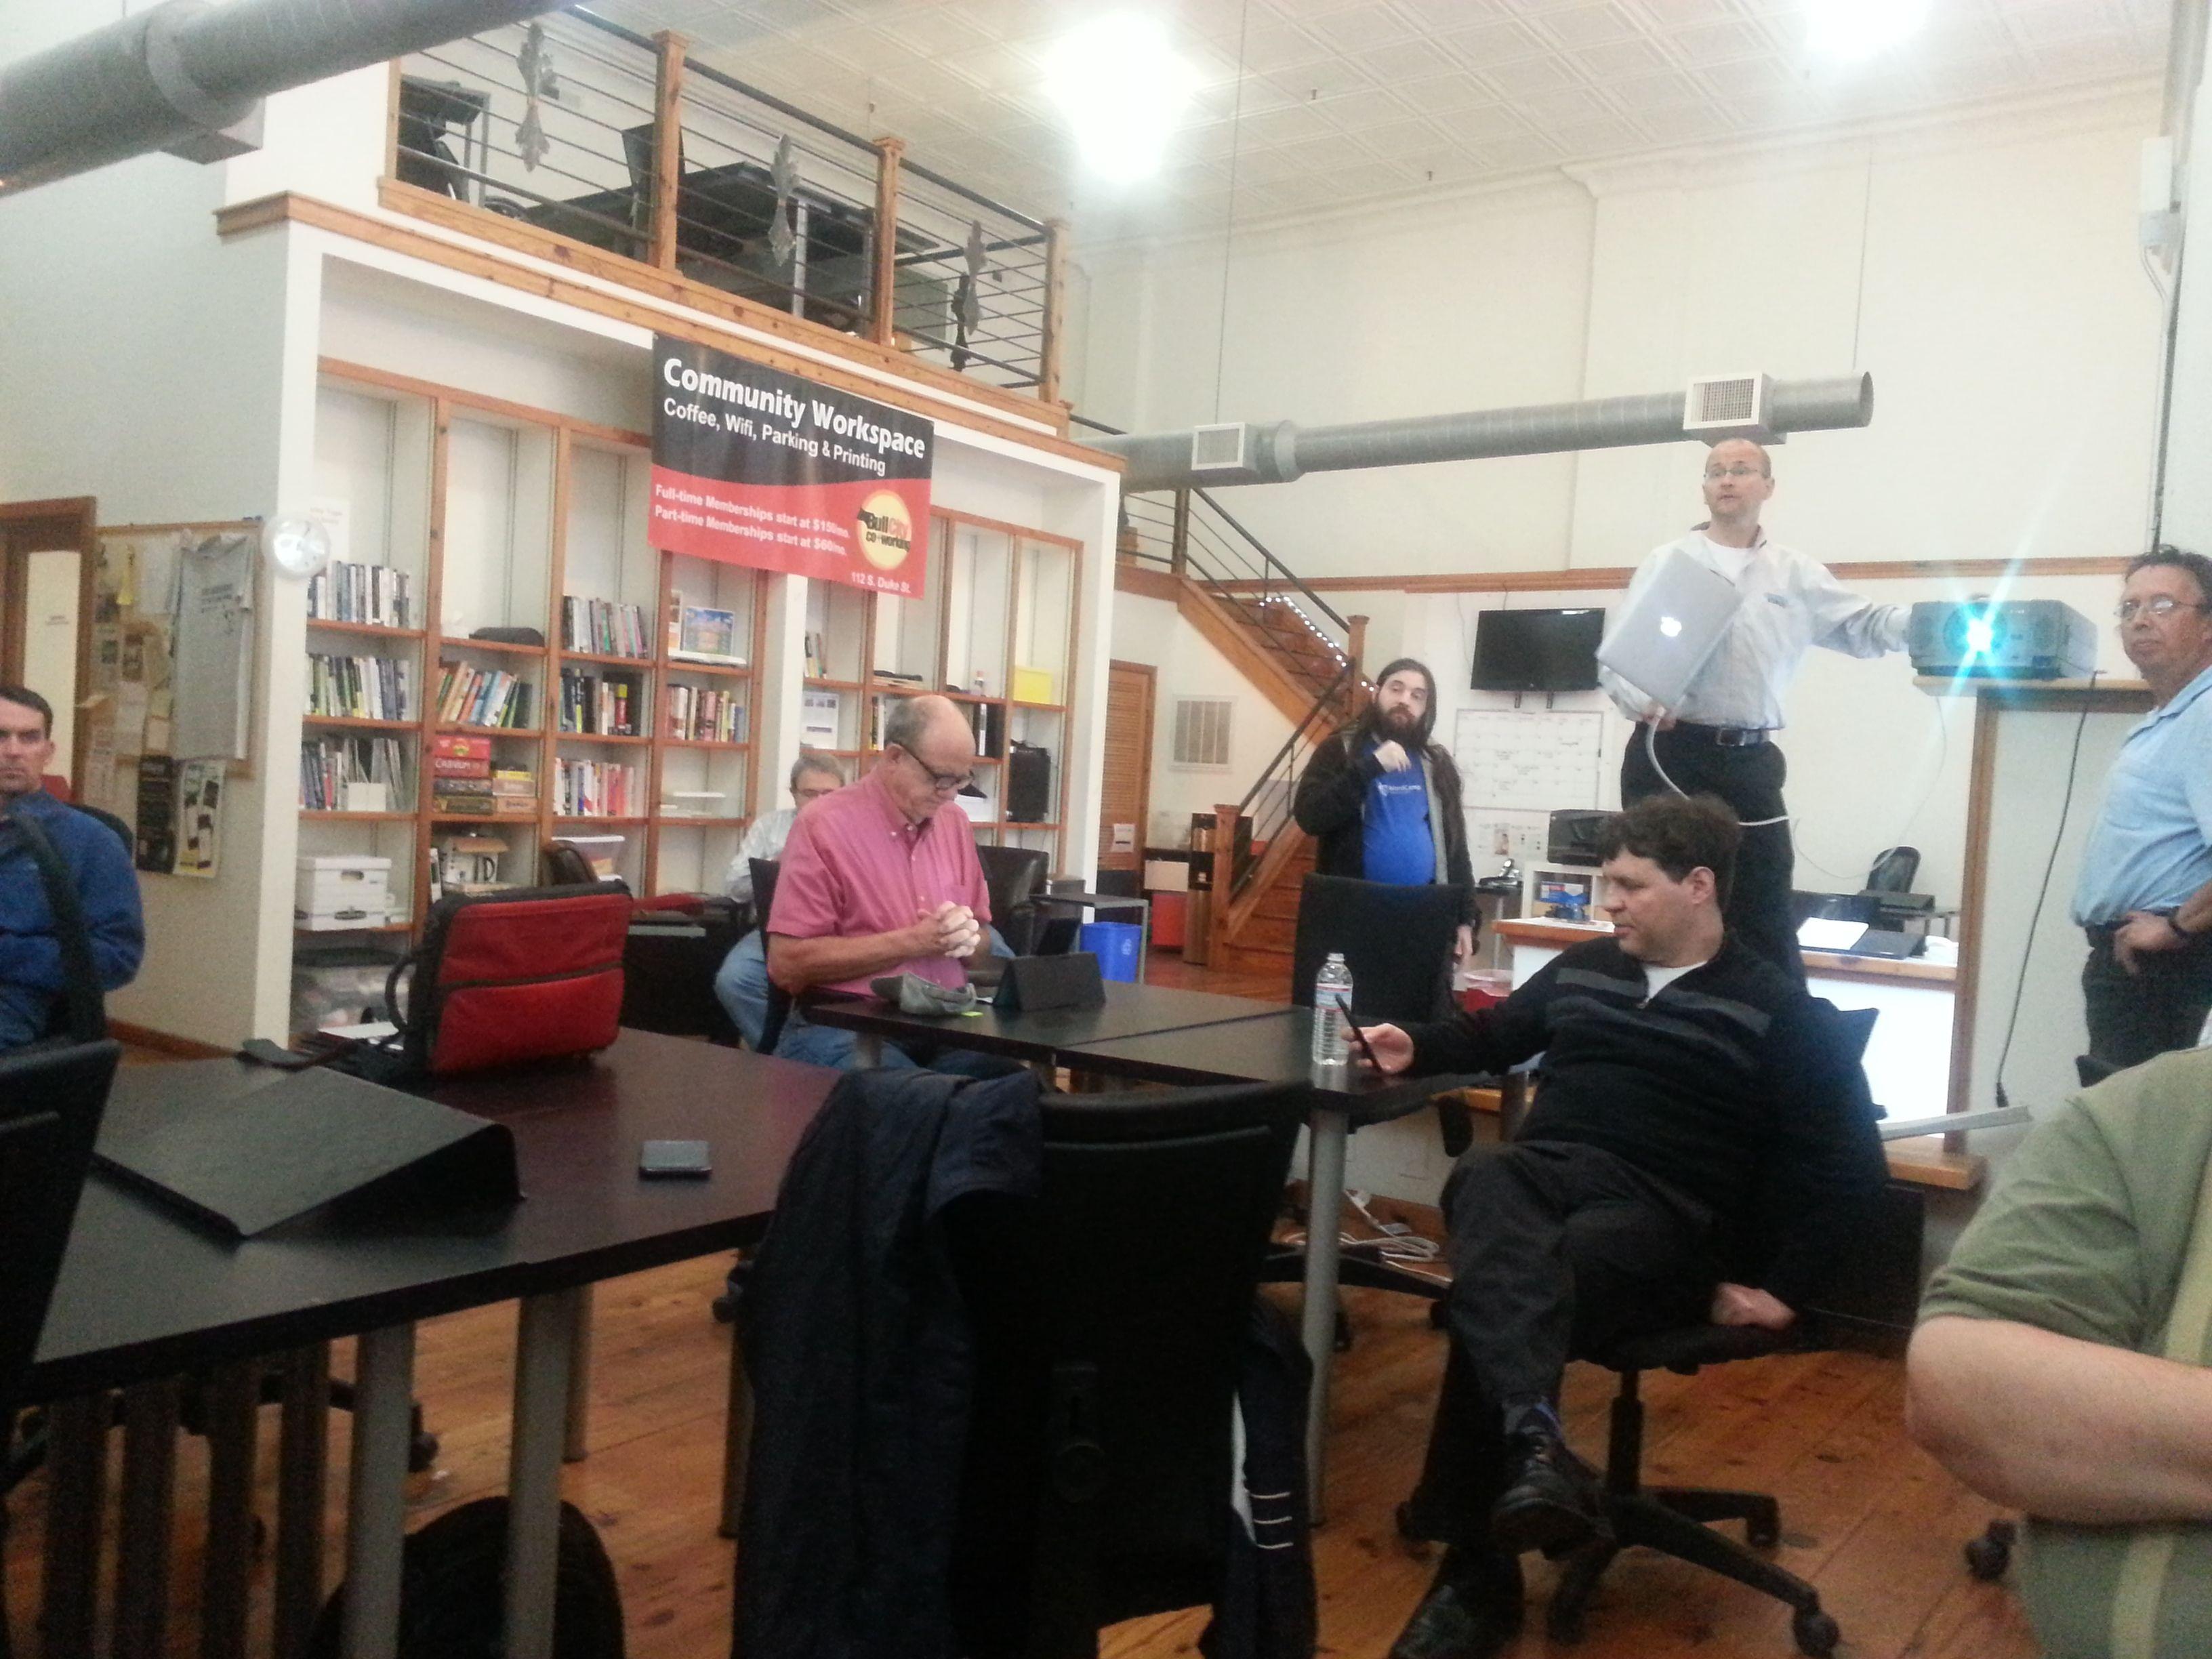 Raleigh-Durham RTP WordPress Meetup Group